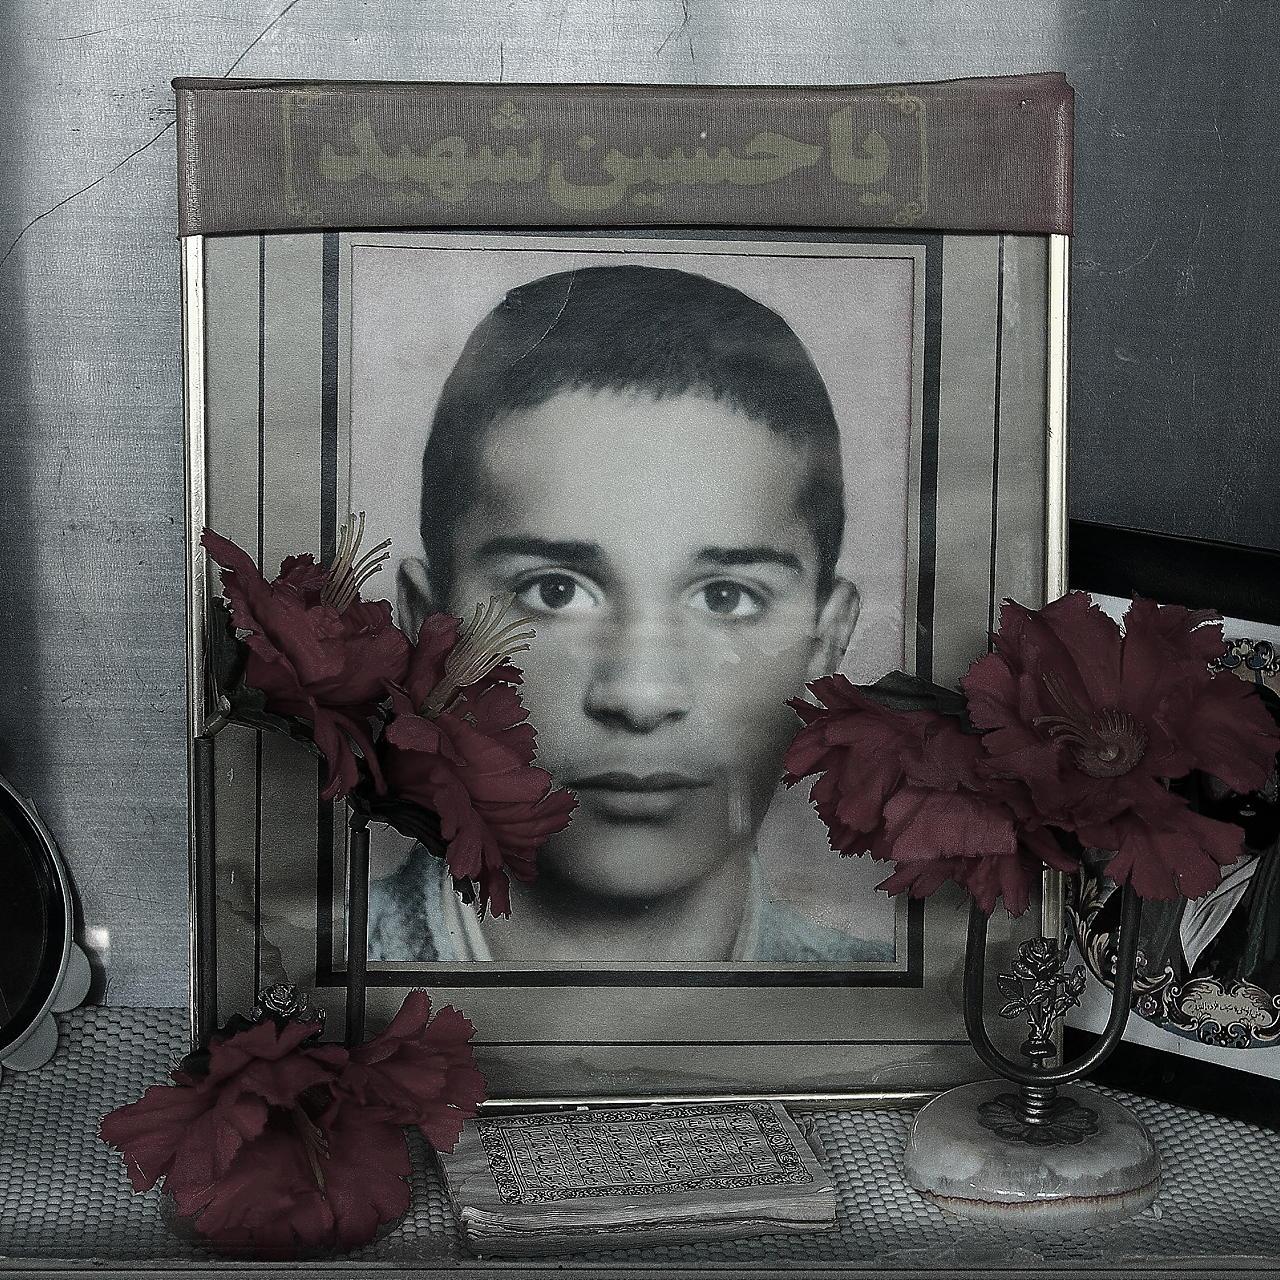 Roberto Guerra Toledo - Les désastres de la guerre - The disasters of war. - Felix Schoeller Photoaward